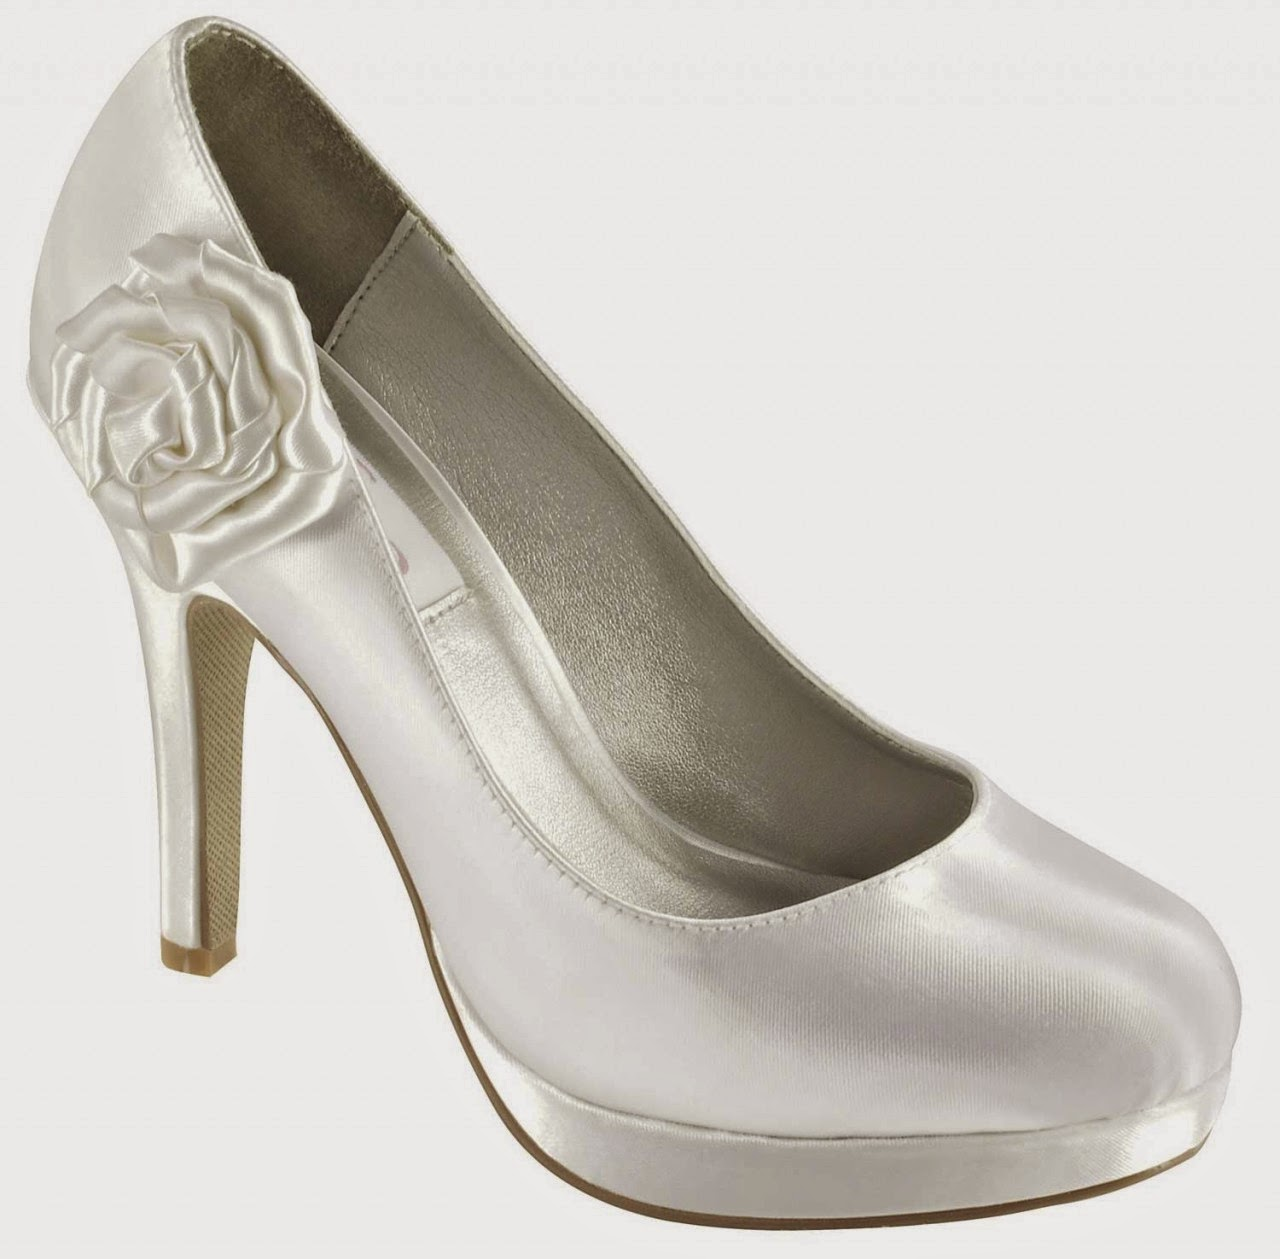 Beautiful Wedding Shoes 033 - Beautiful Wedding Shoes